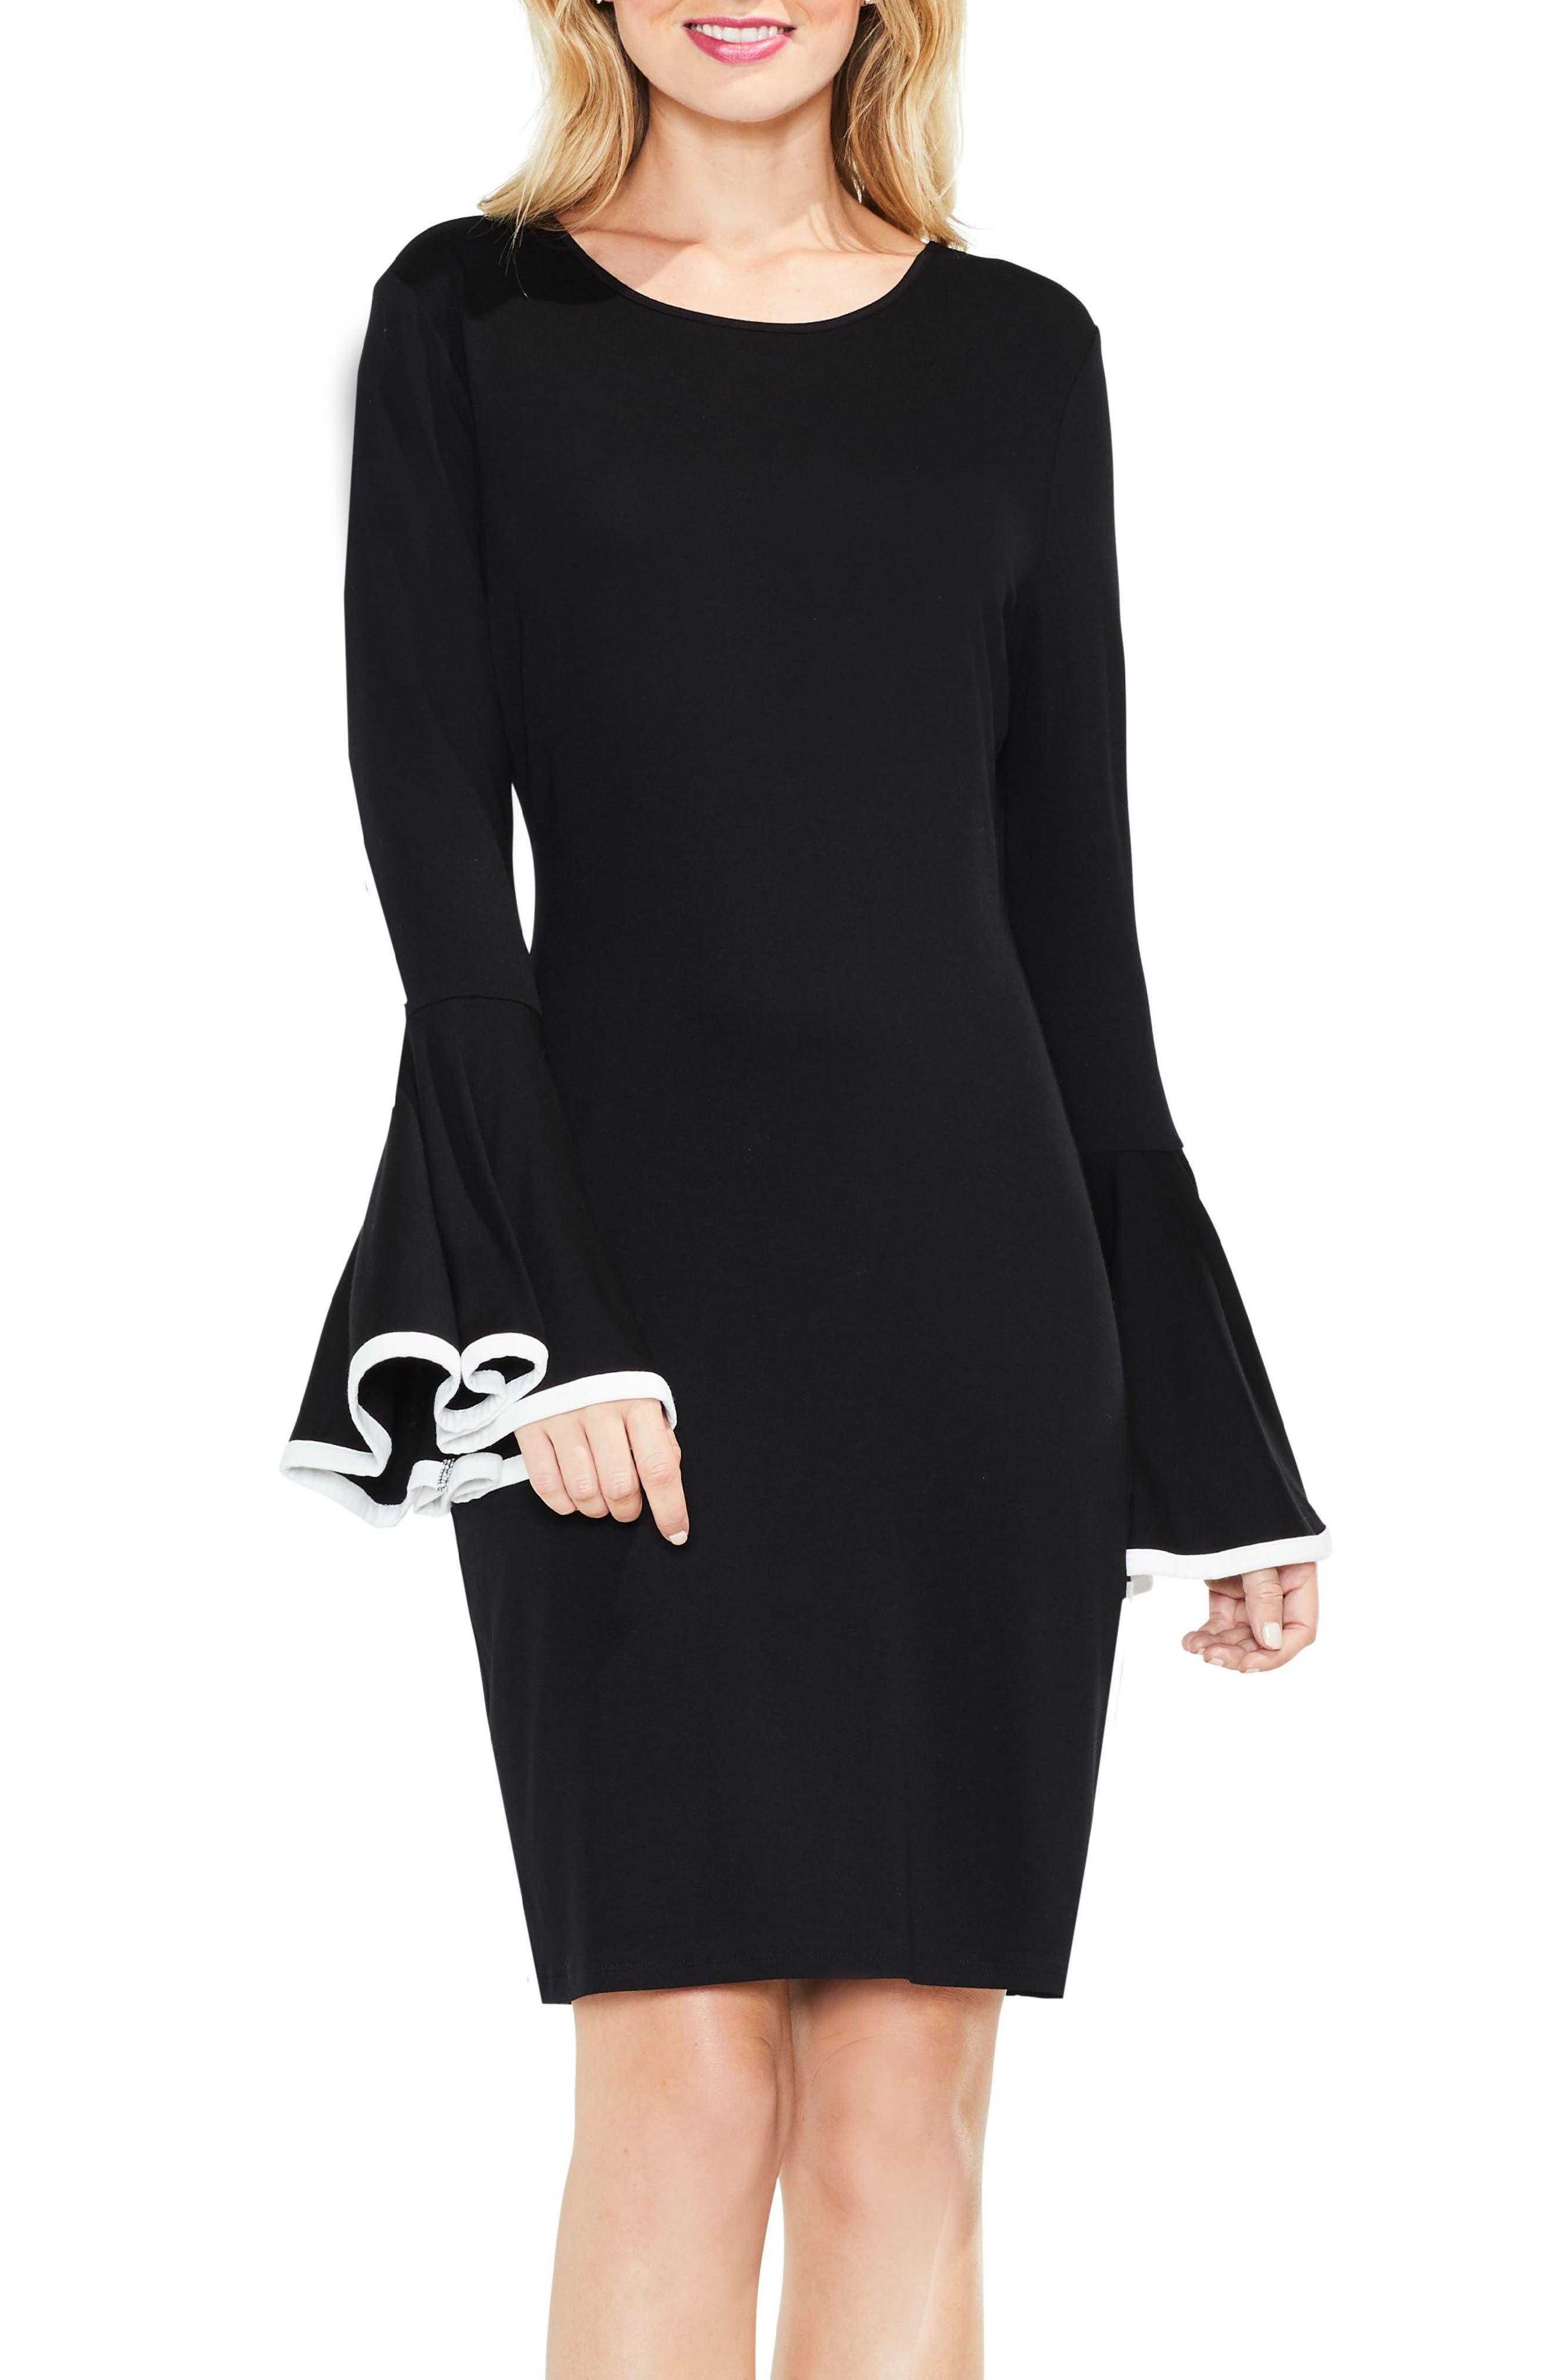 Main Image - Vince Camuto Circle Cuff Dress